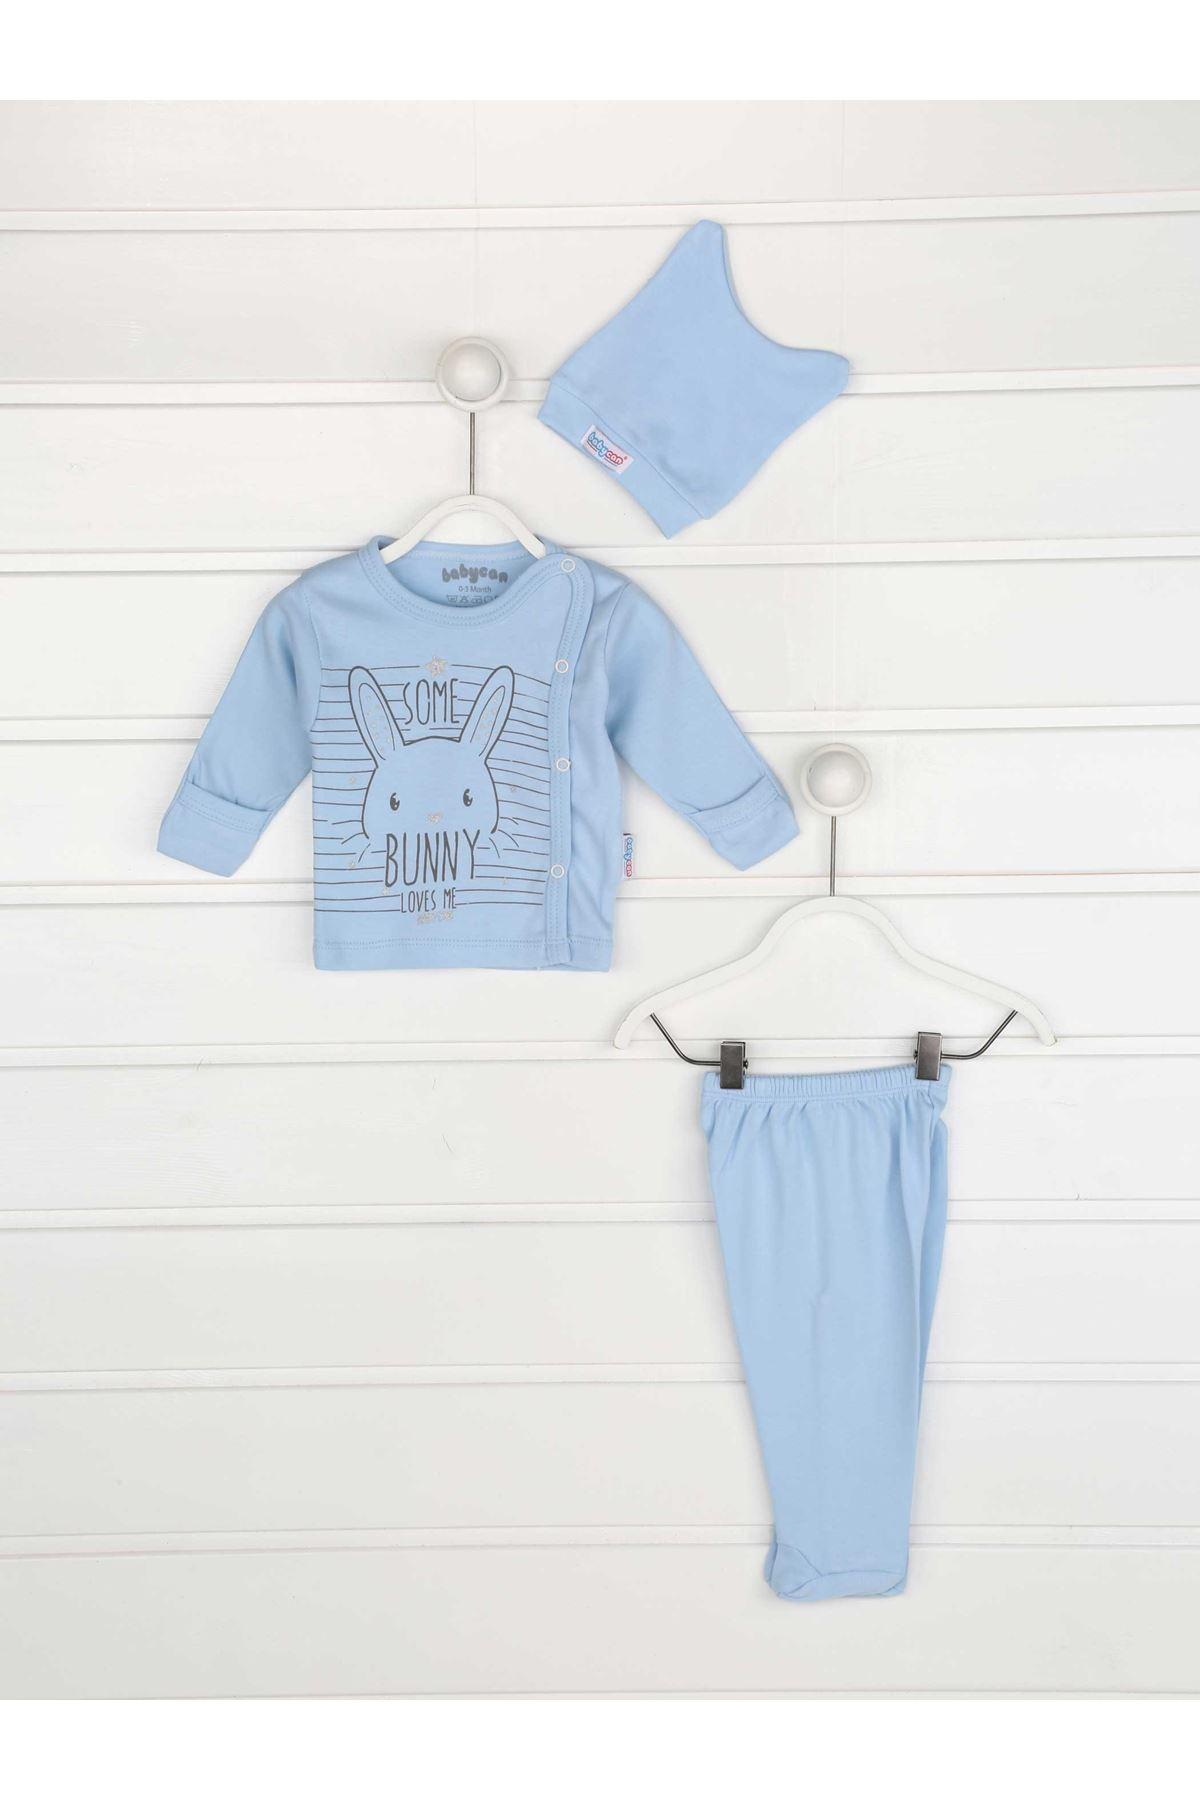 Blue Swaddle Gloved Male Baby 3 Pcs The Zibin team